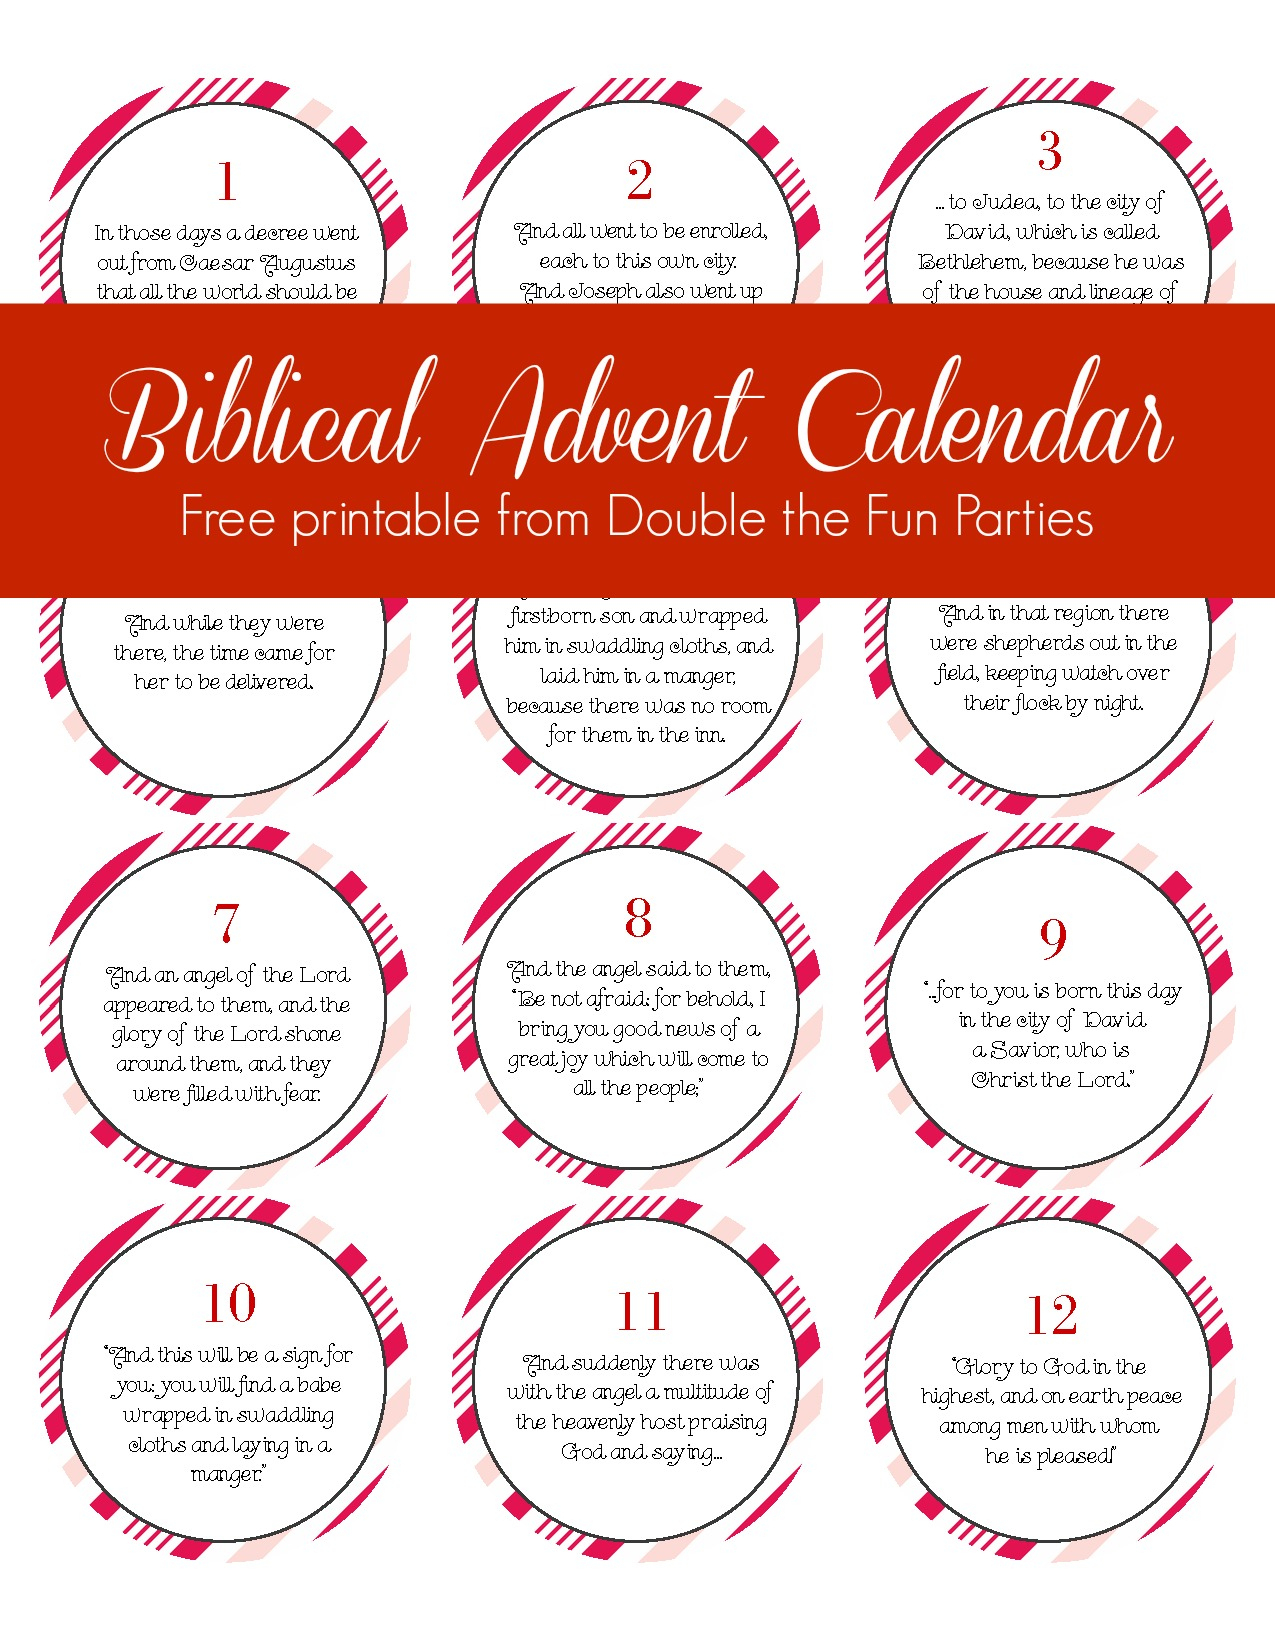 Free Biblical Advent Calendar Printable | The Party Teacher - Free Printable Nativity Story